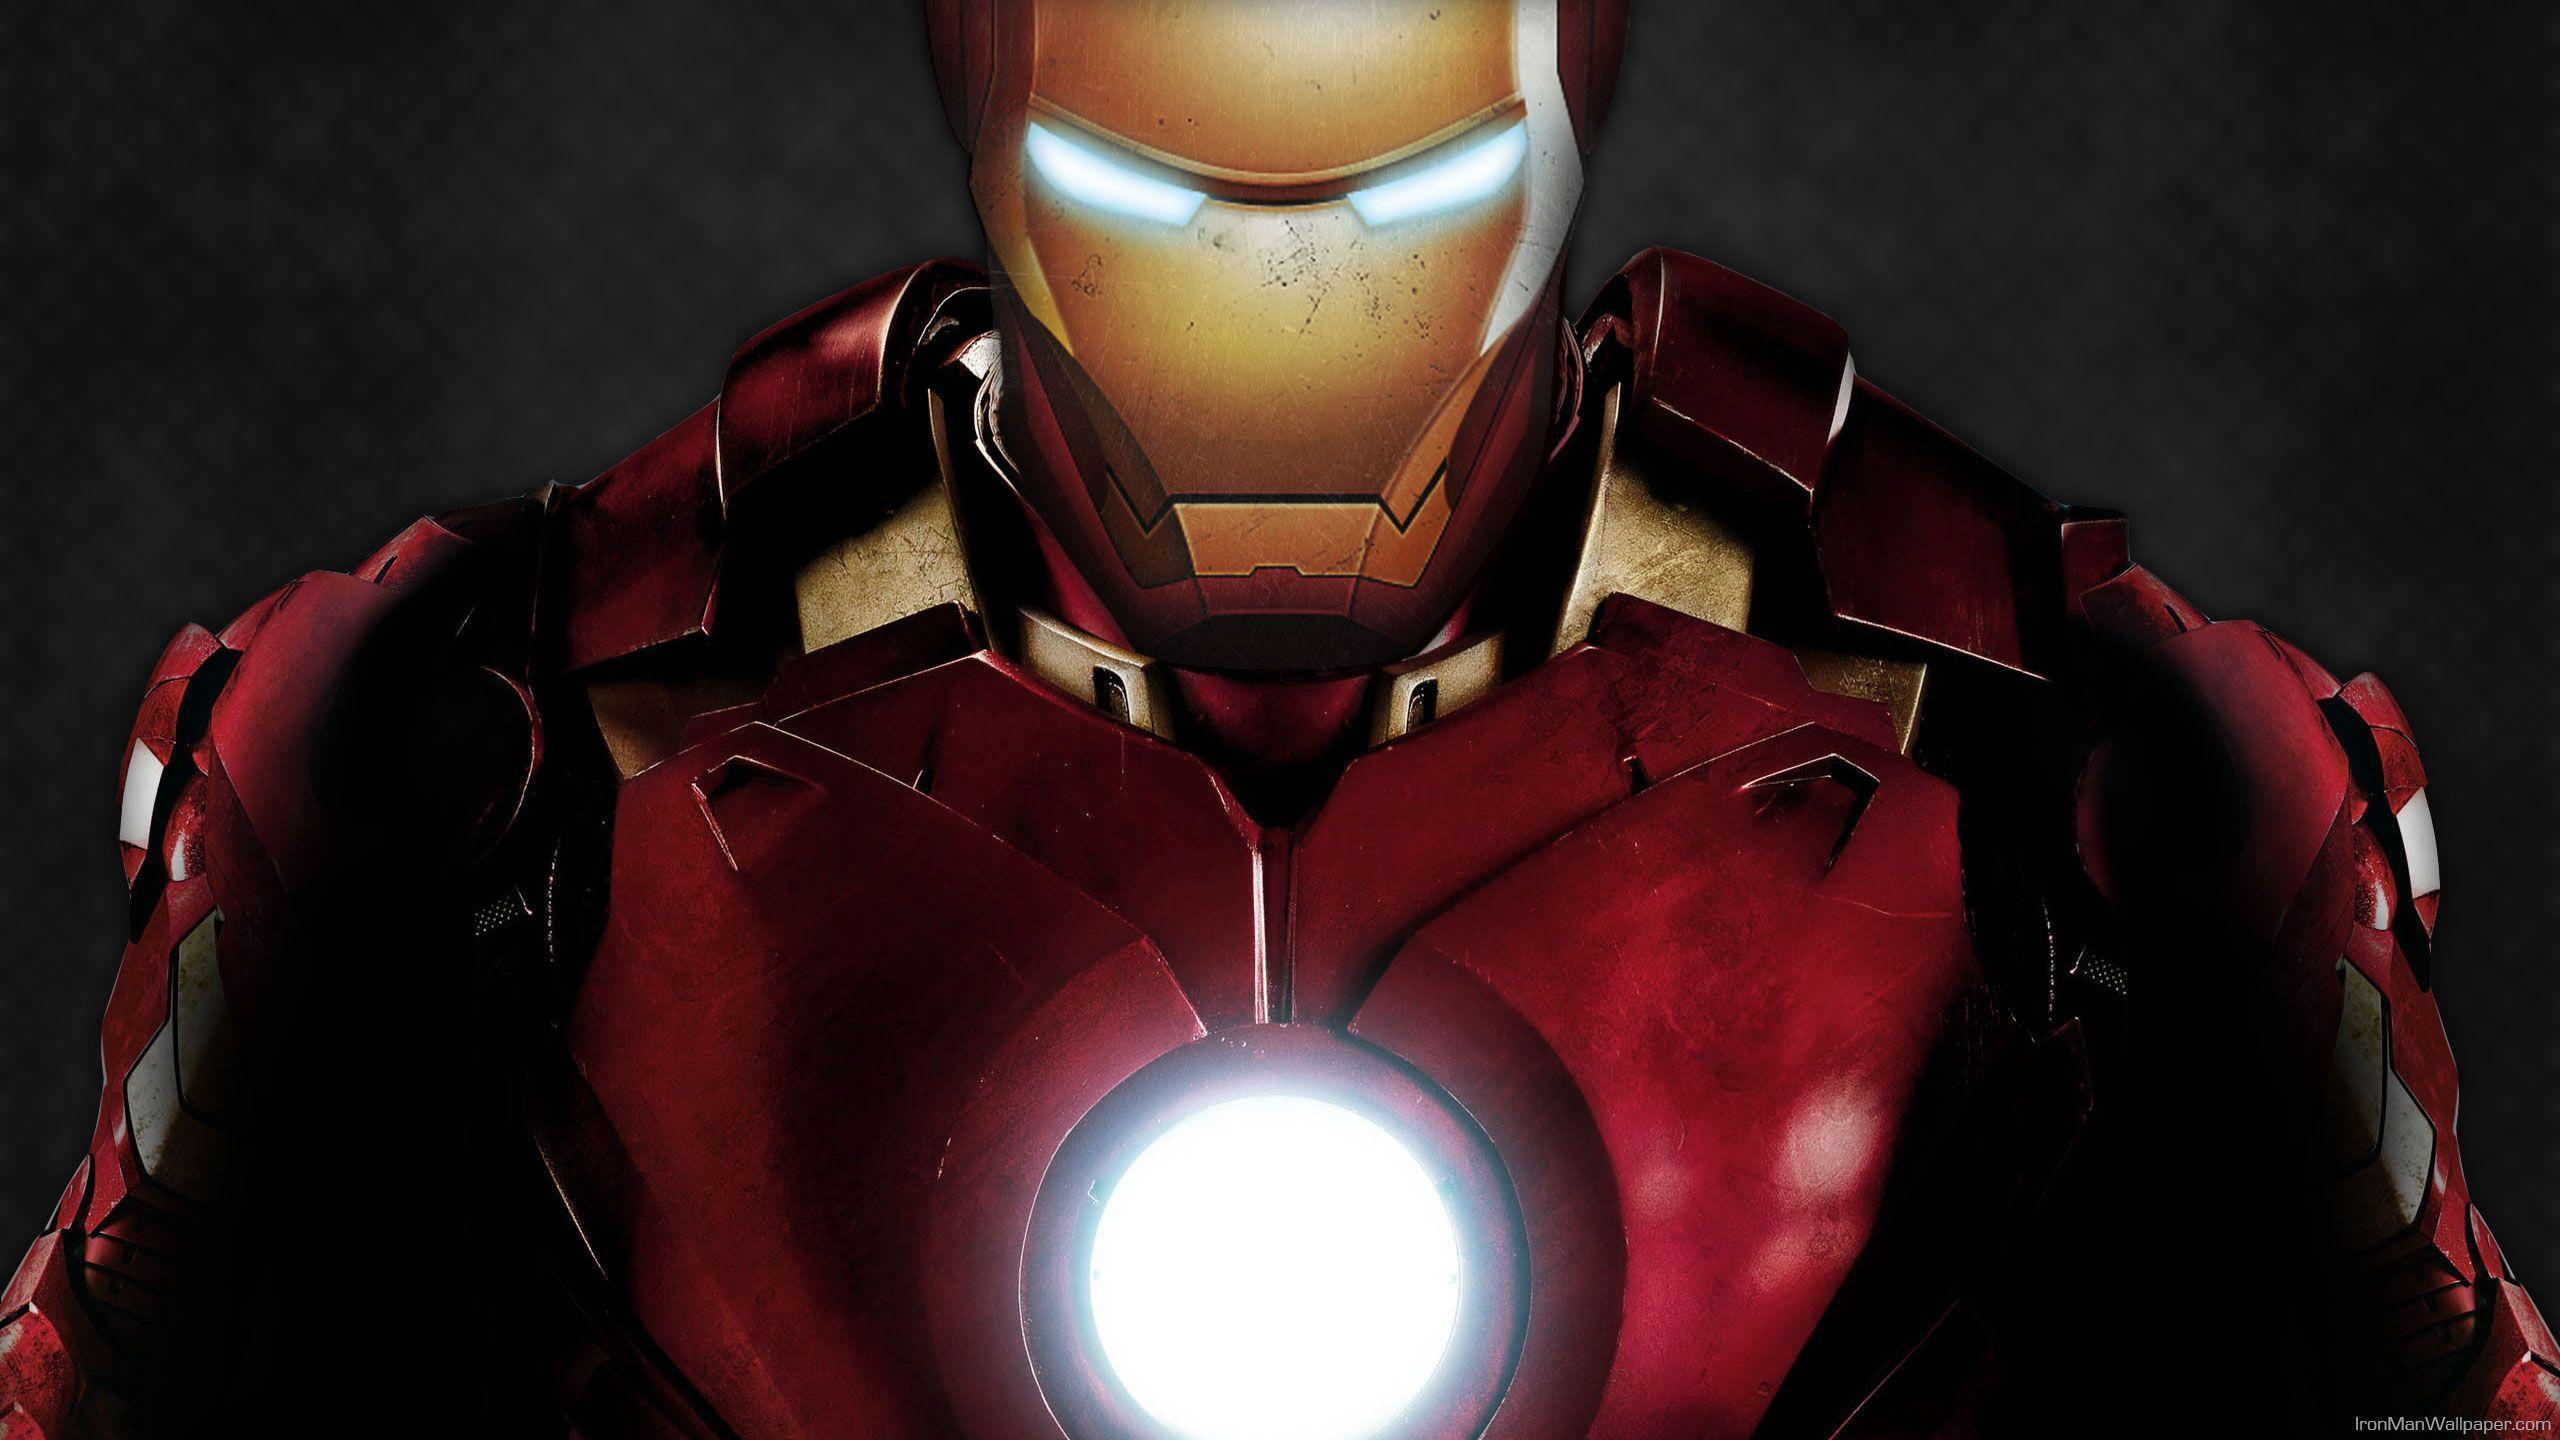 Iron Man Face Wallpapers - Wallpaper Cave